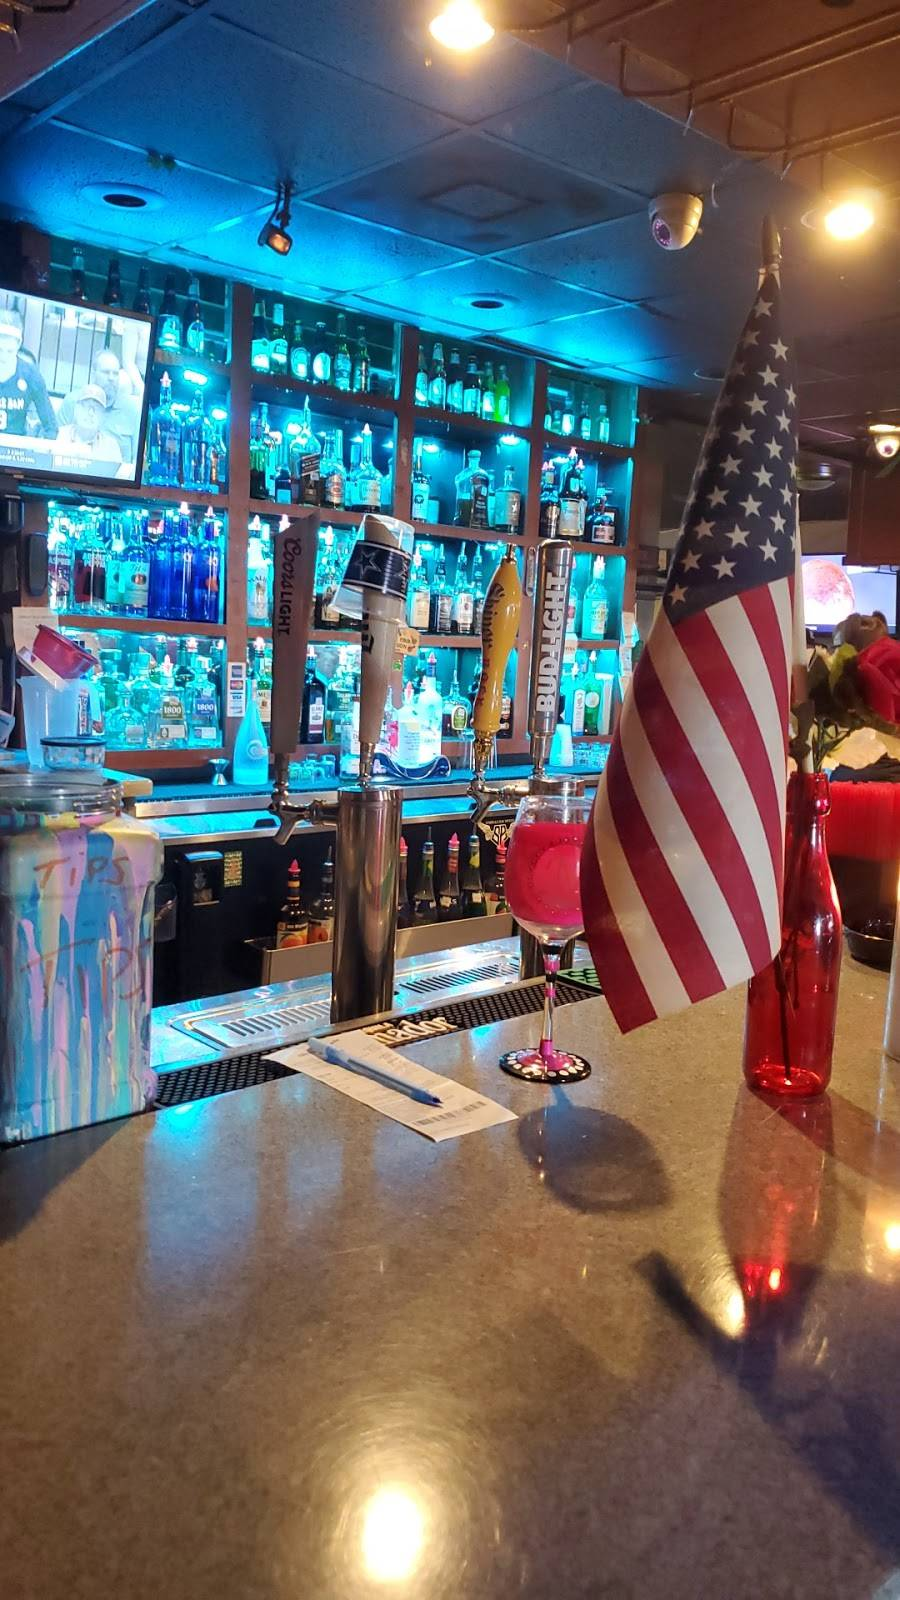 Fusion bar and grill - restaurant    Photo 8 of 10   Address: 503 E Hurst Blvd, Hurst, TX 76053, USA   Phone: (817) 510-3364